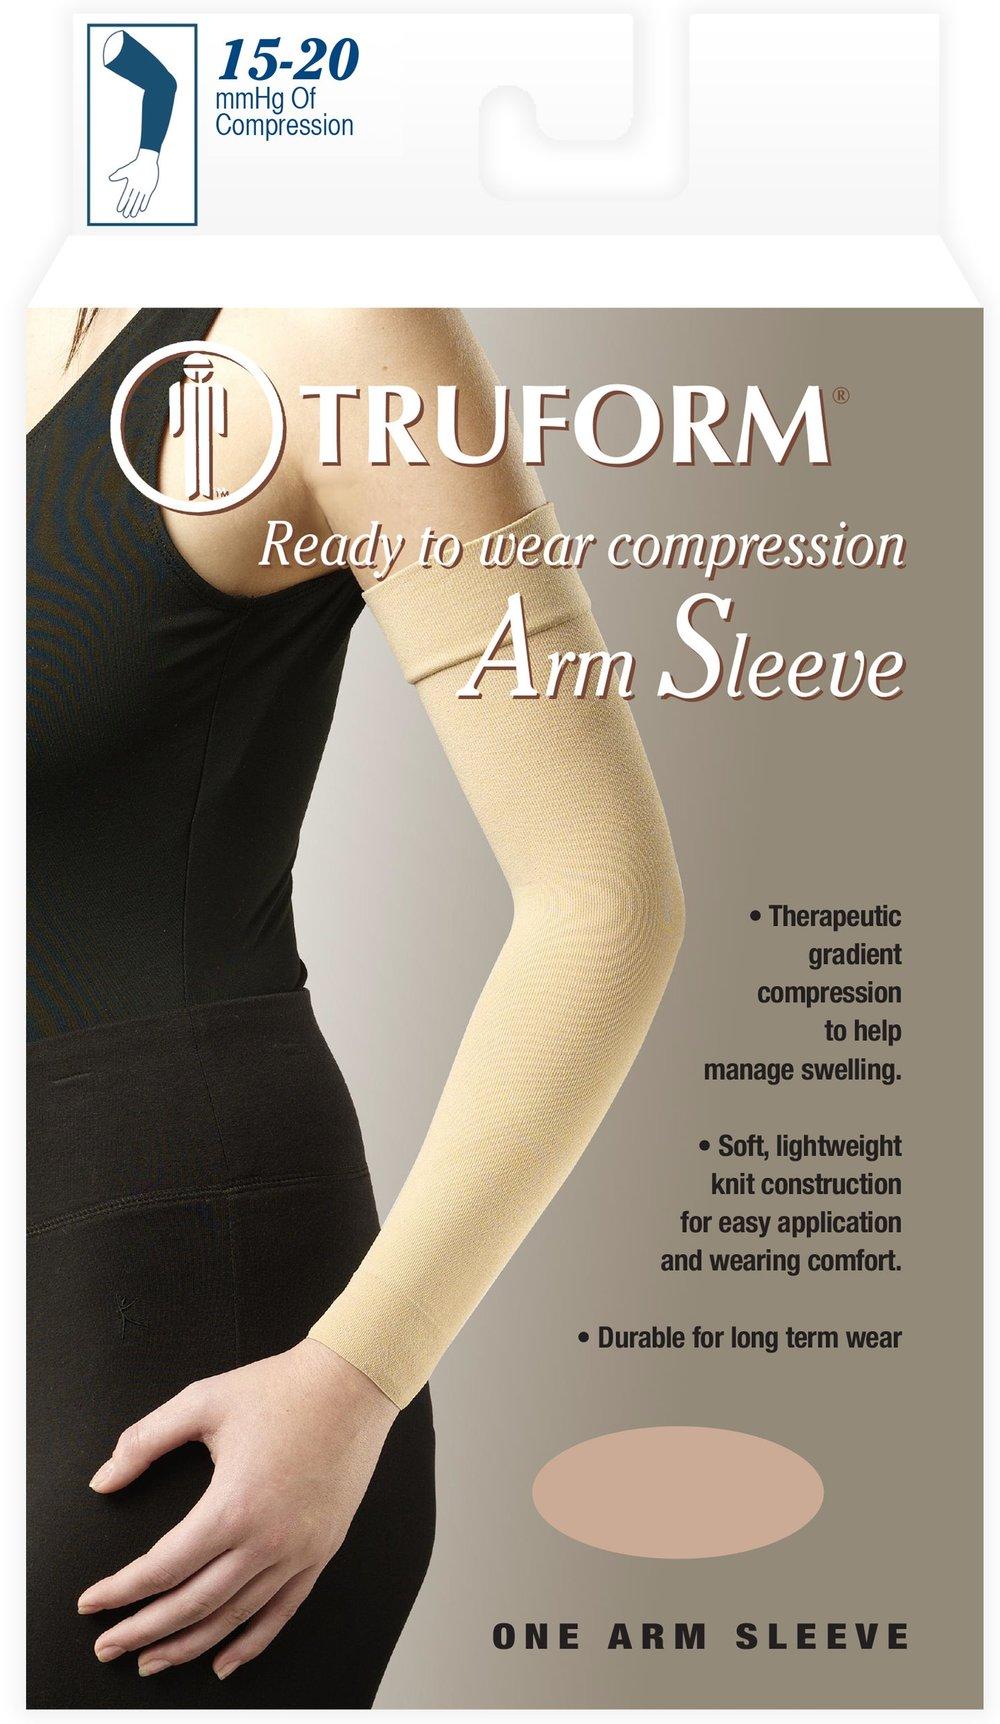 3315 / READY-TO-WEAR ARM SLEEVE, SOFT TOP / 15-20 MMHG